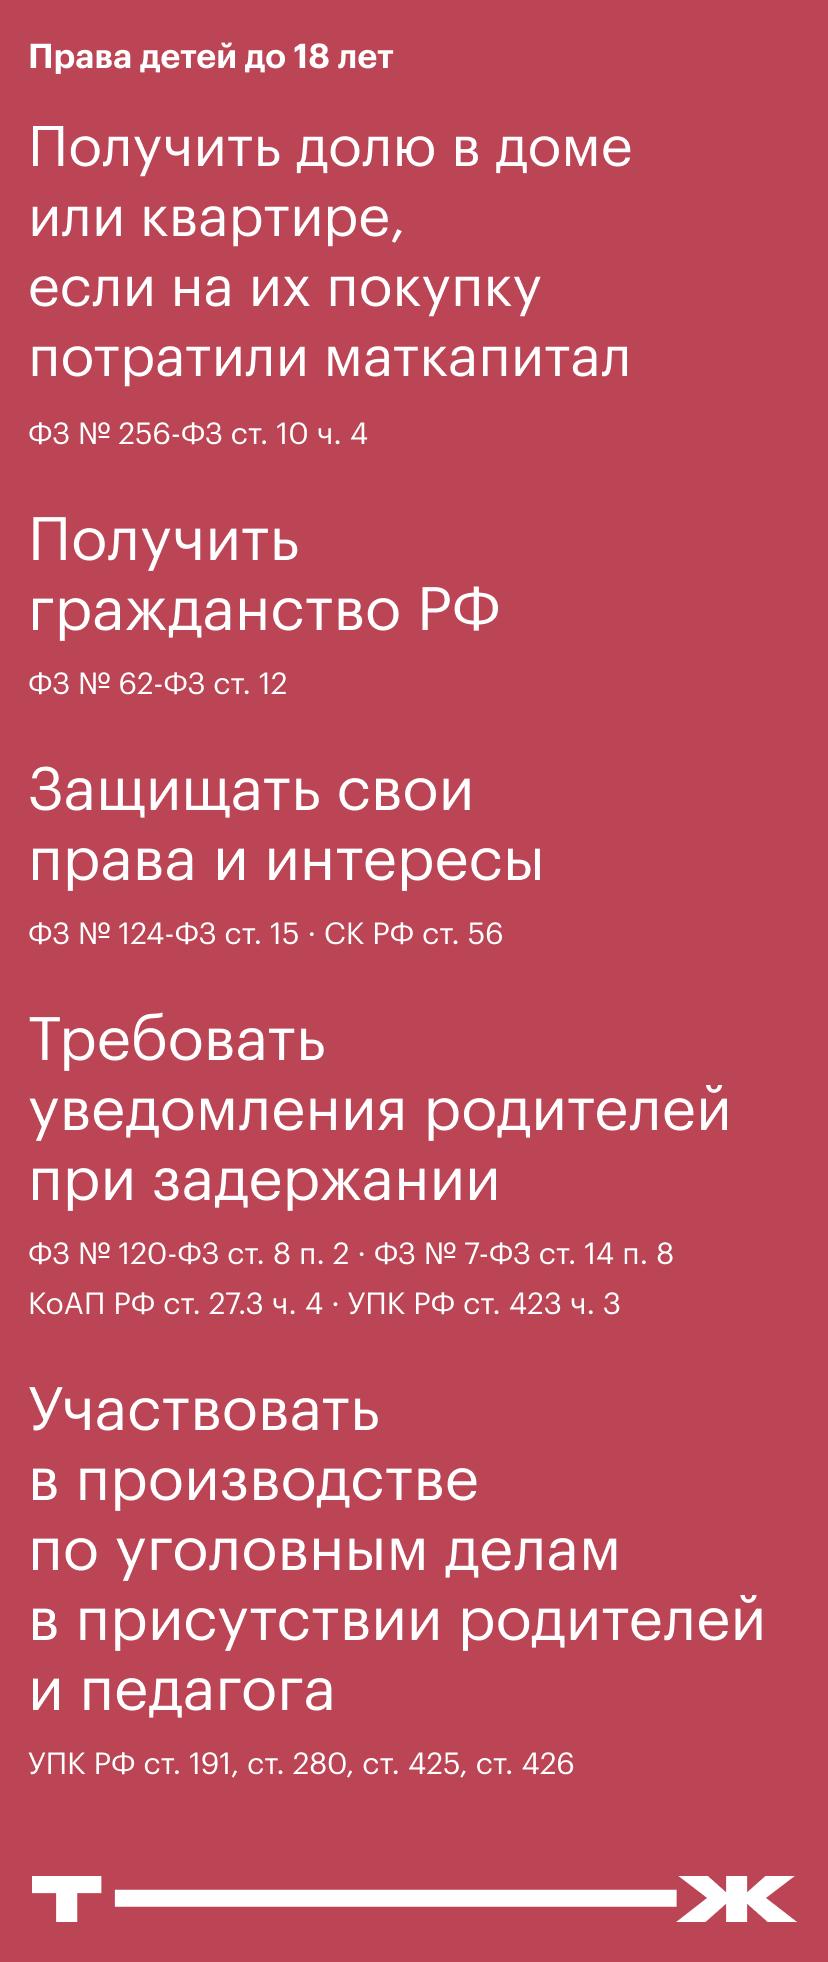 кредит под залог земли в иркутске